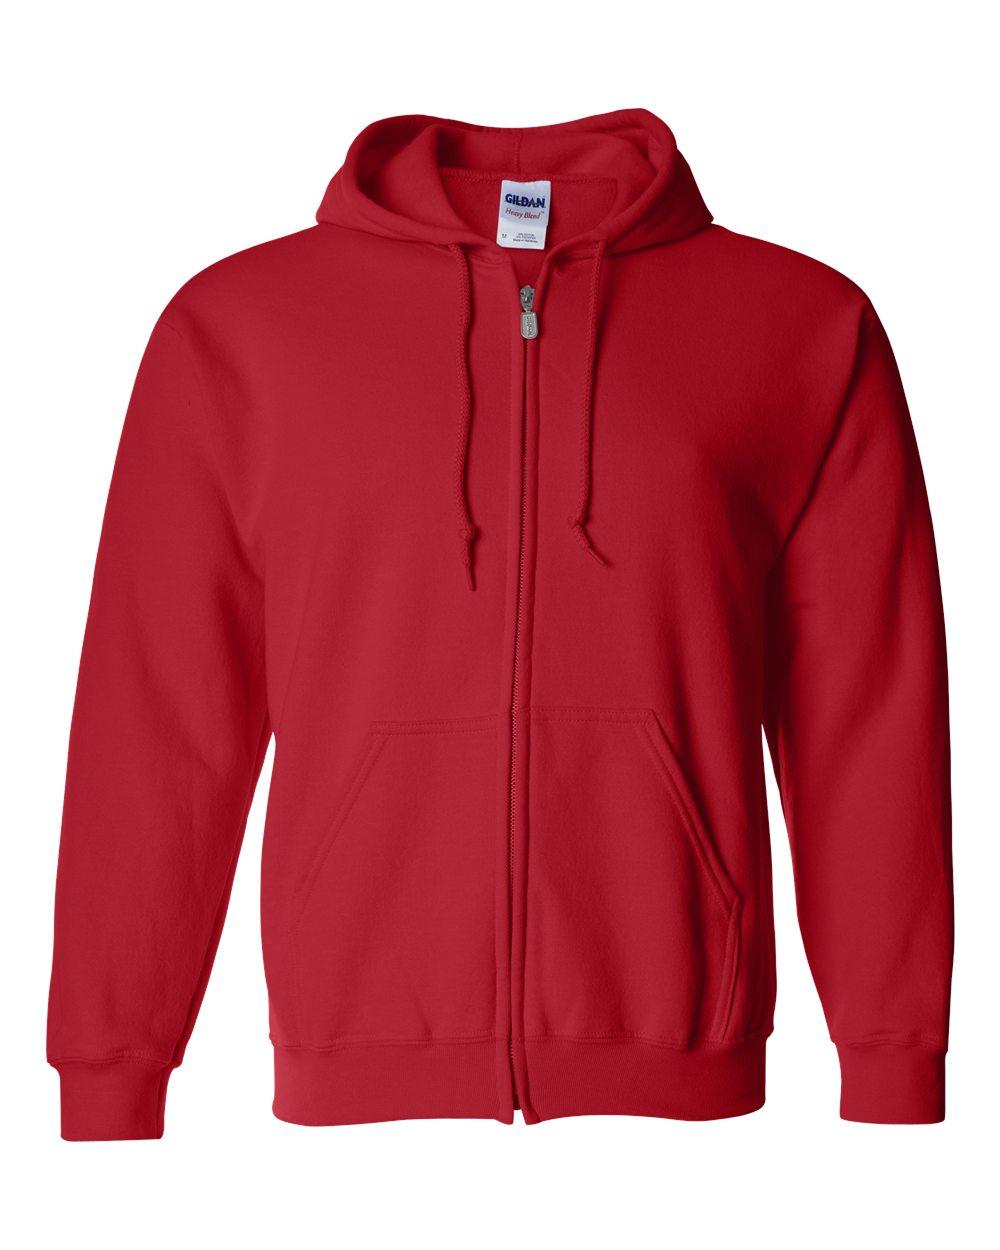 48b12f26d345bd Detail Feedback Questions about Gildan Men s Cardigan Hoodies Sweatshirts  Brand Clothing Fashion Zip Hoodie Man Casual Slim Fit Pocket Sweatshirt  Sportswear ...